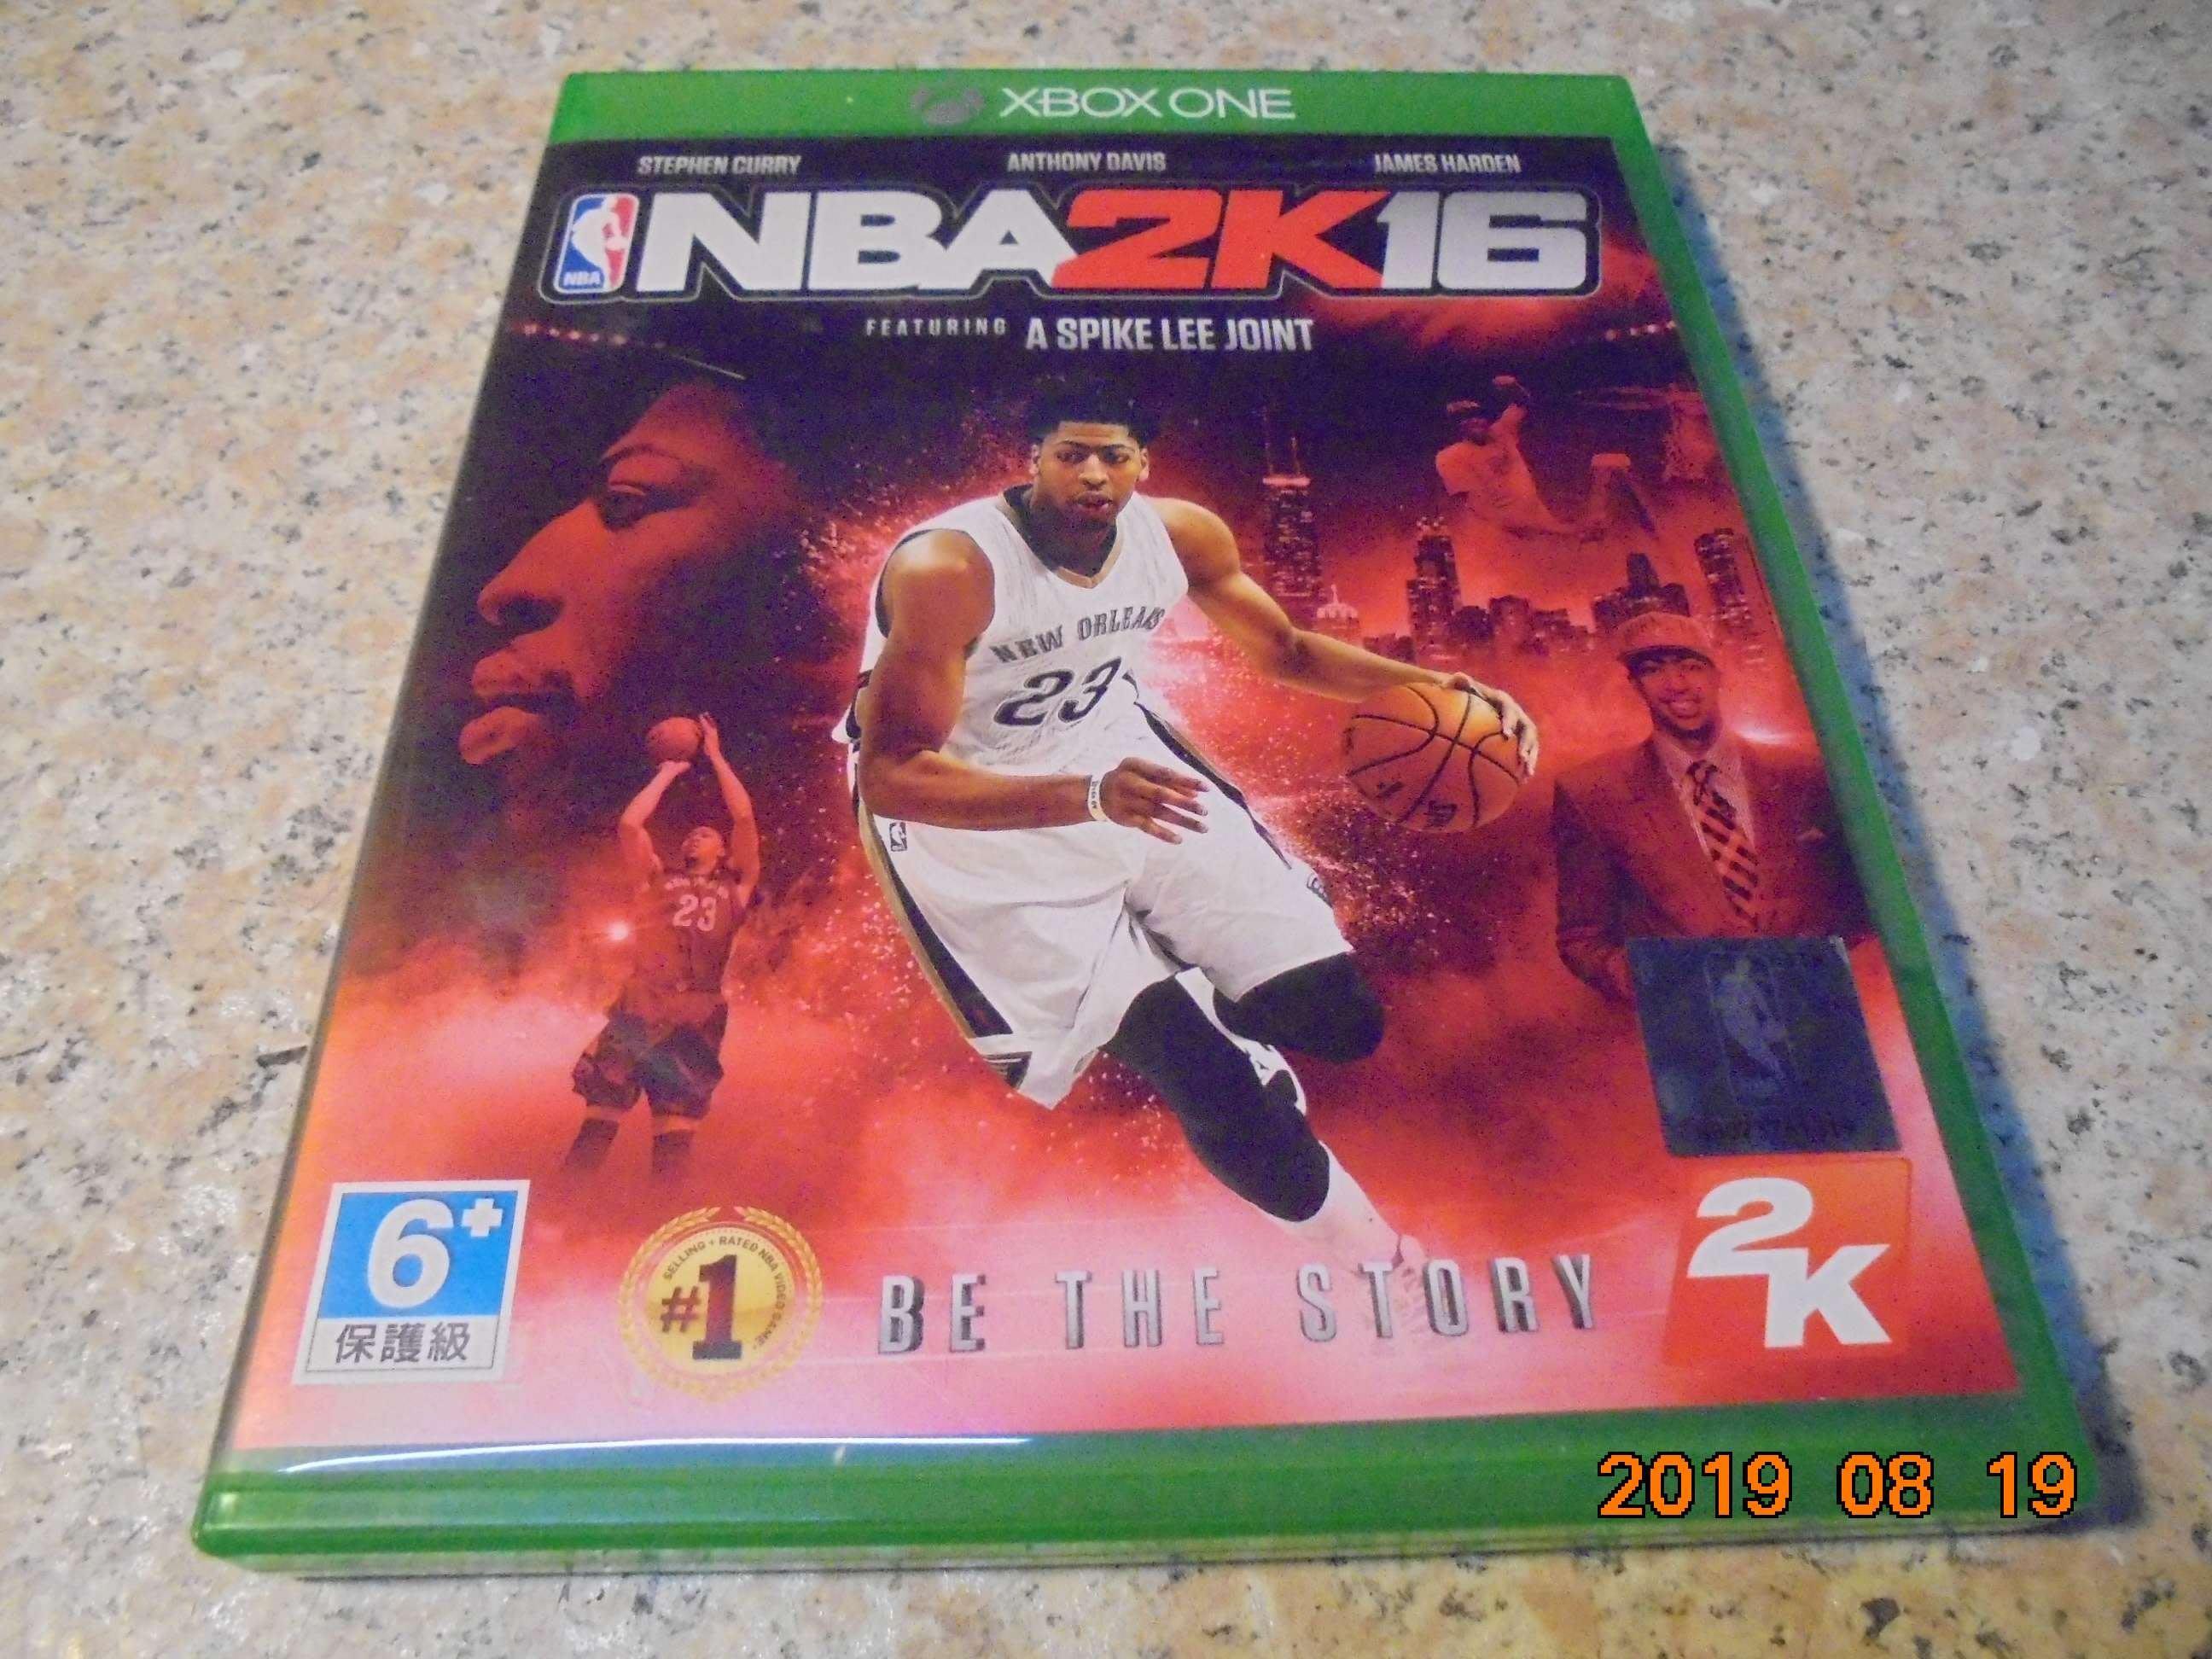 XBOX ONE NBA2K16 中文版 直購價300元 桃園《蝦米小鋪》